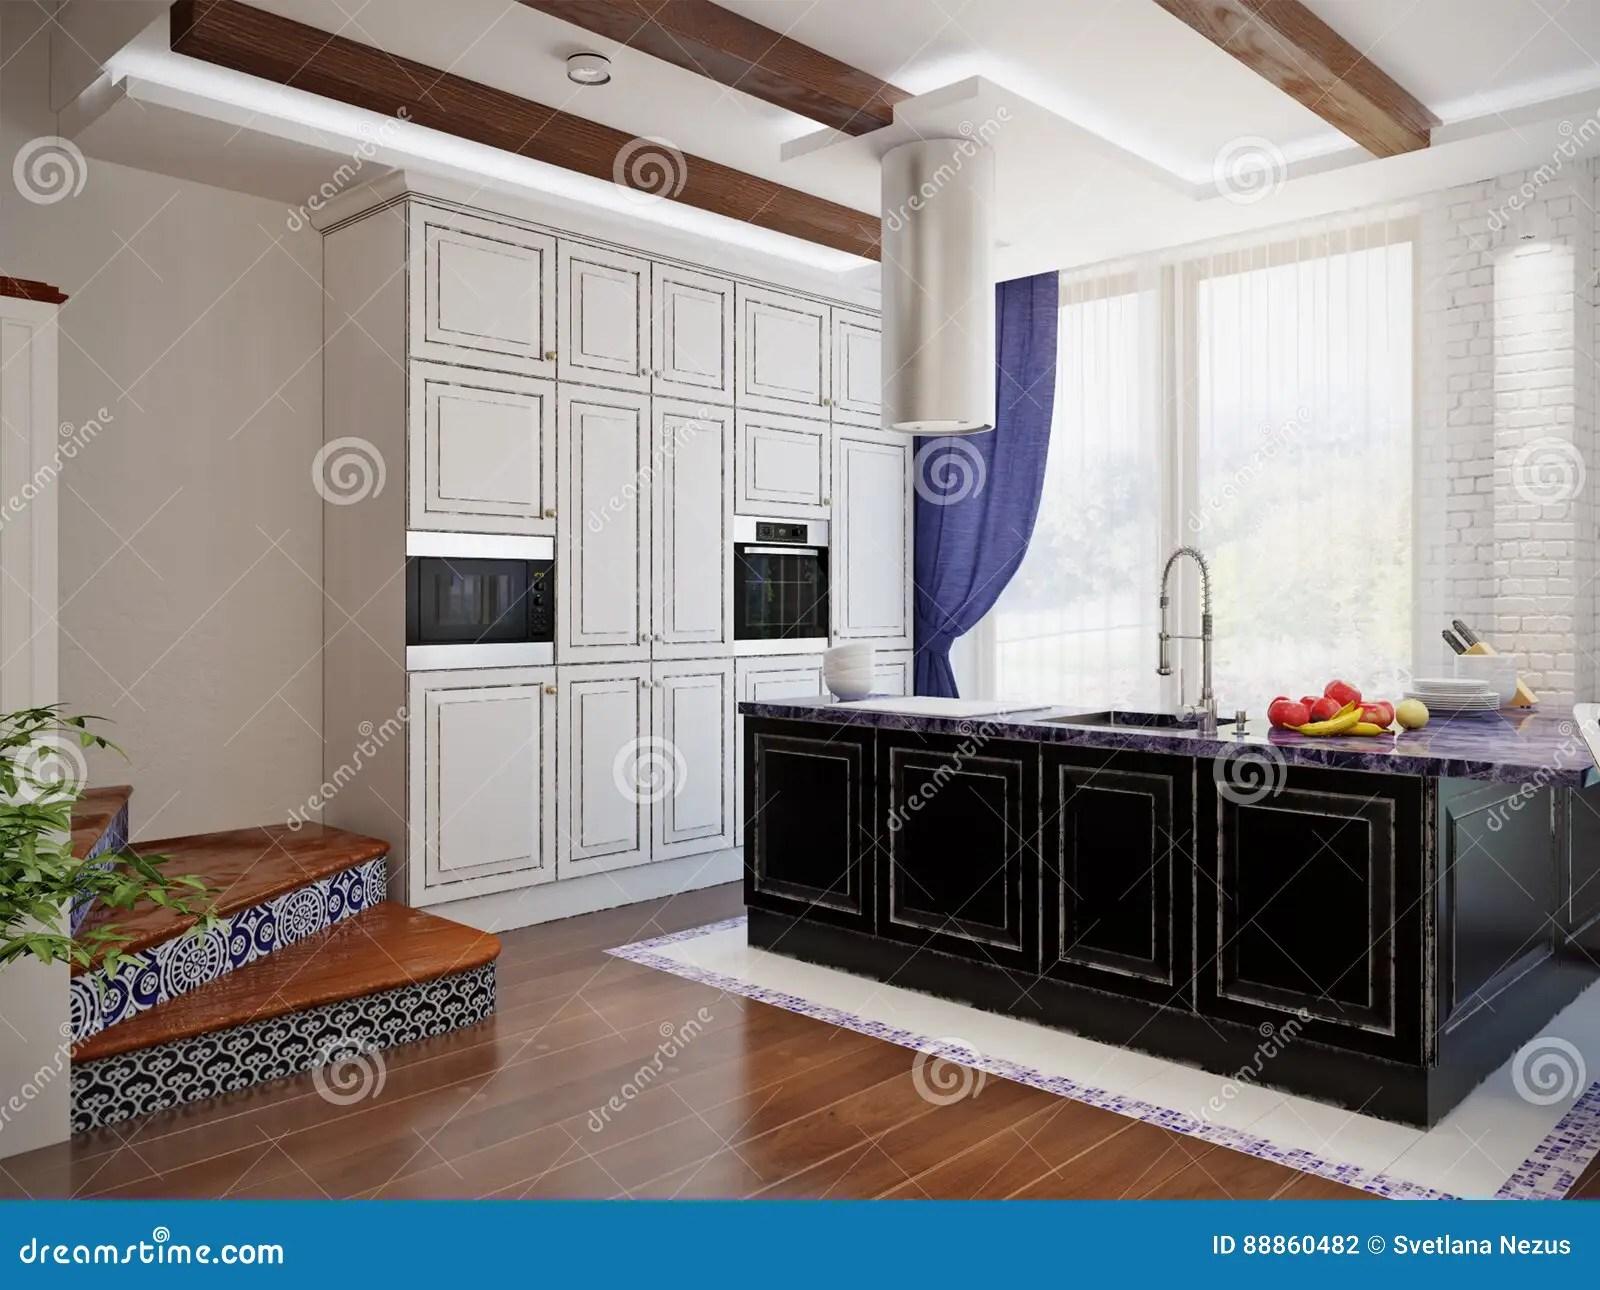 kitchen wall art decor cabinet organizers for 餐厅和厨房经典室内设计库存例证 插画包括有经典 用餐 国家 地区 餐厅和厨房经典室内设计